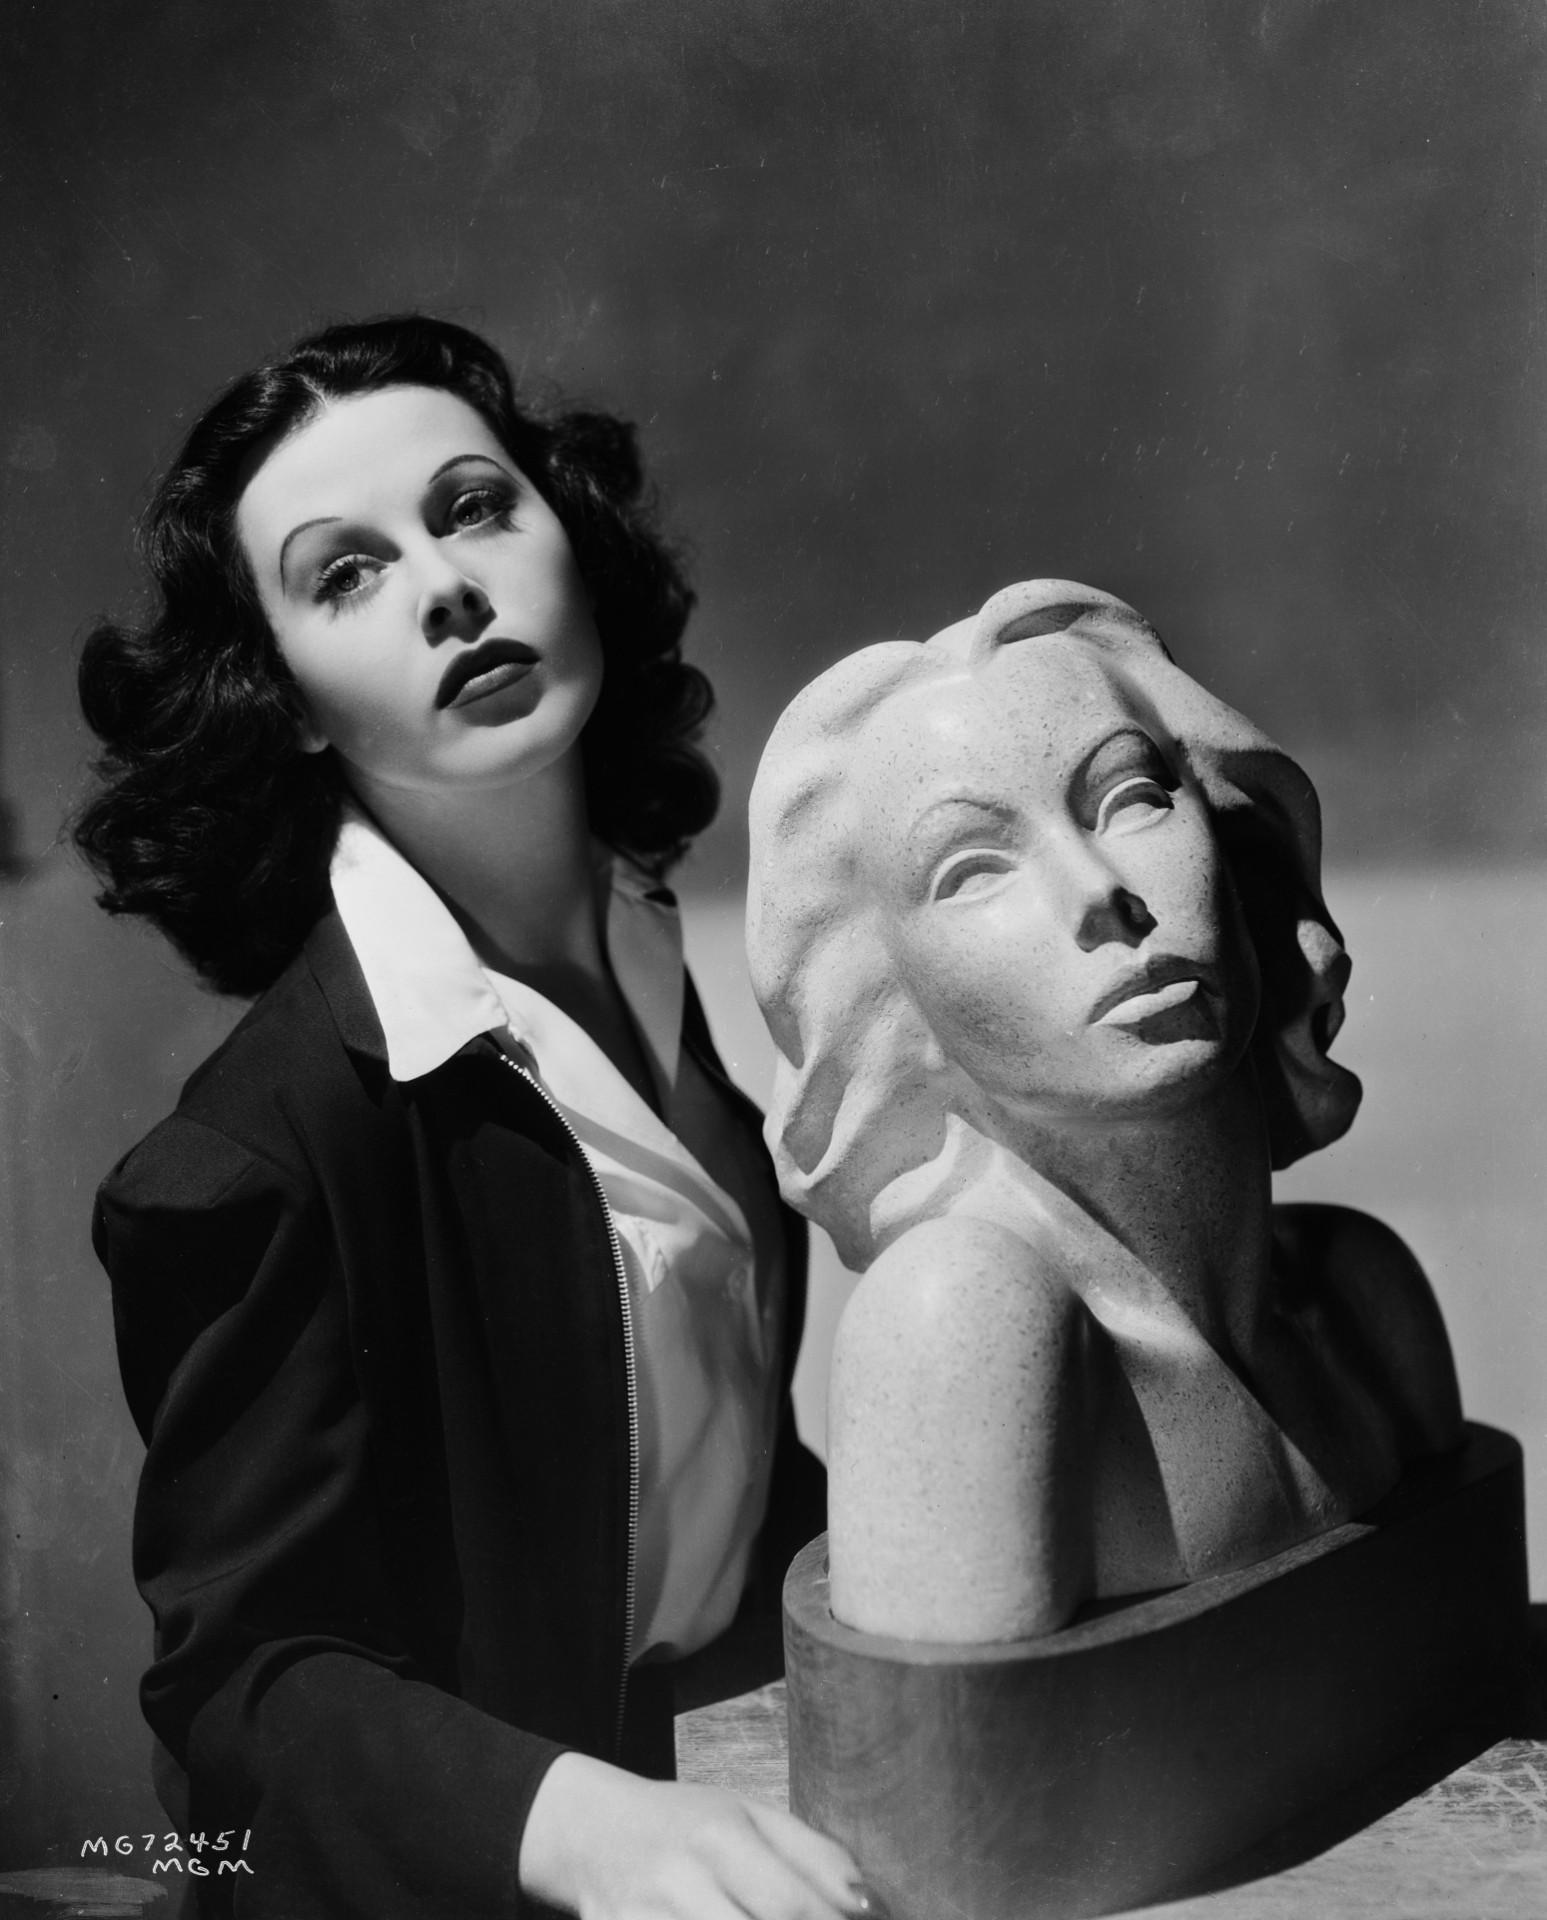 Junto a su escultura, de Nina Saemundsson, en 1939.